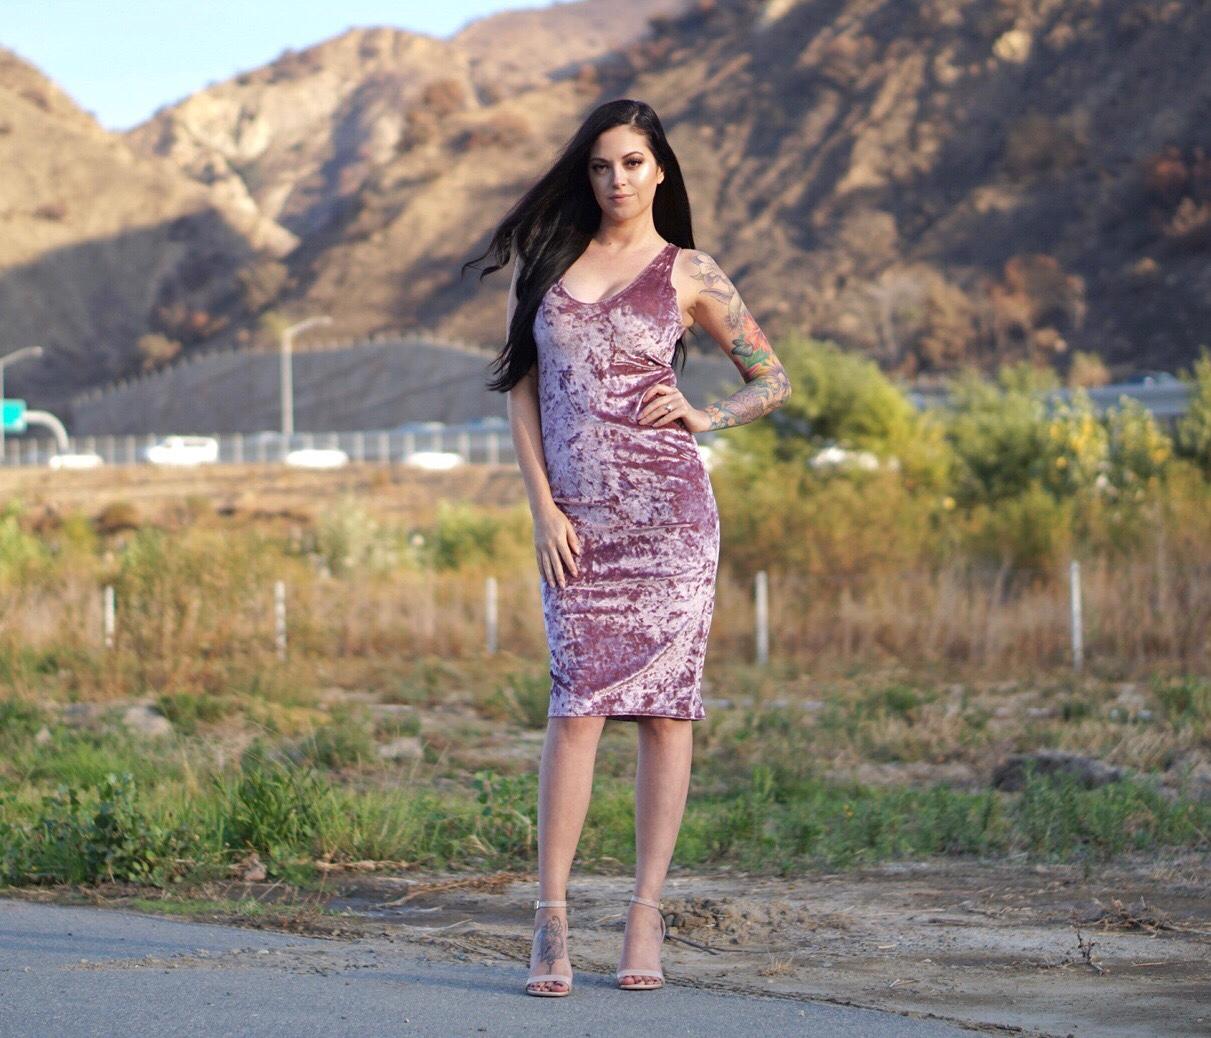 Rose Bodycon Velvet Dress from Shop Pineapple Curls Boutique